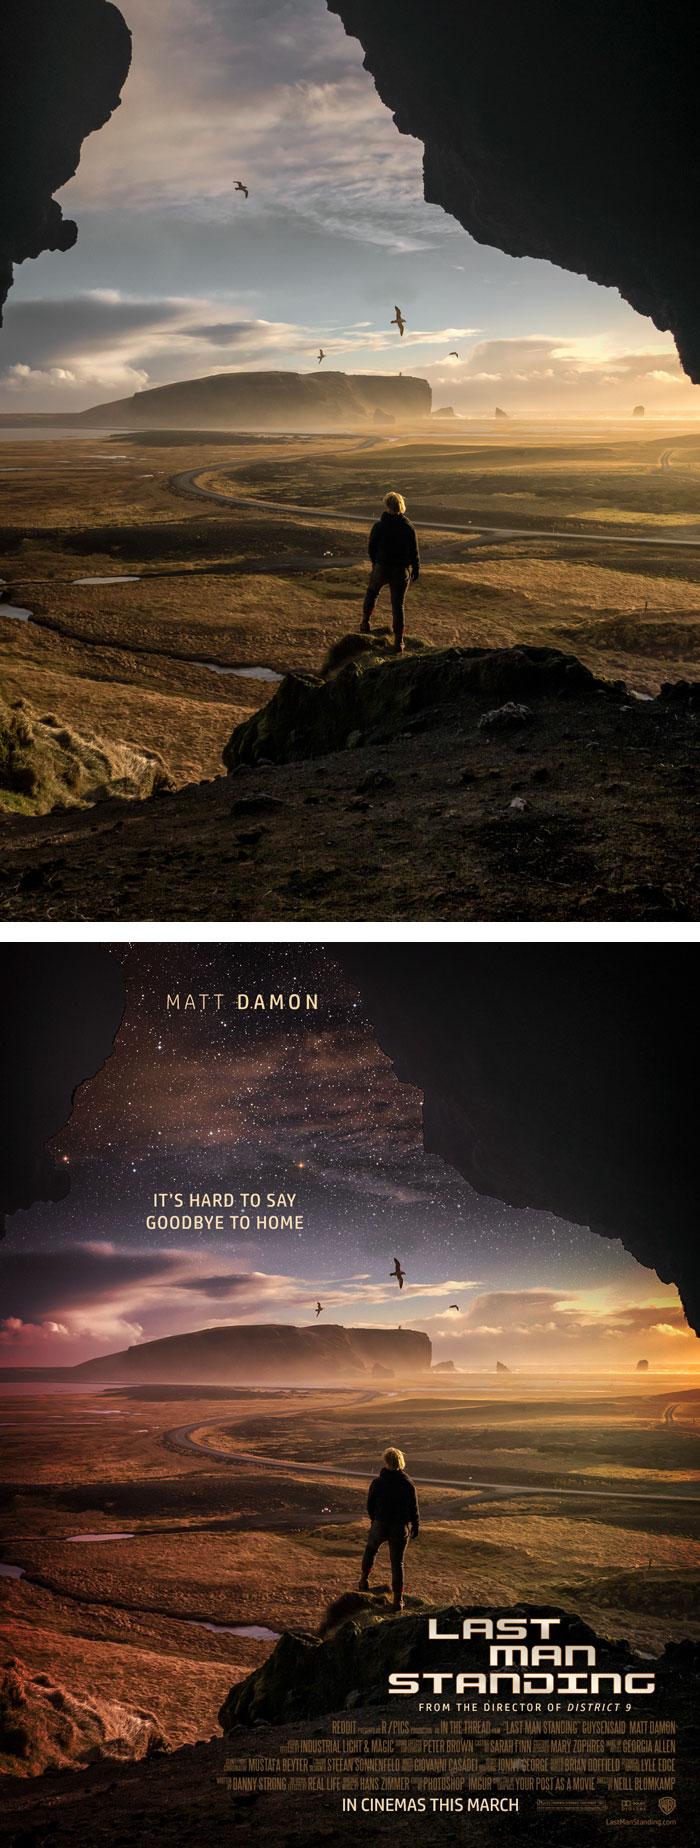 random-photos-turned-into-movie-posters-134__700